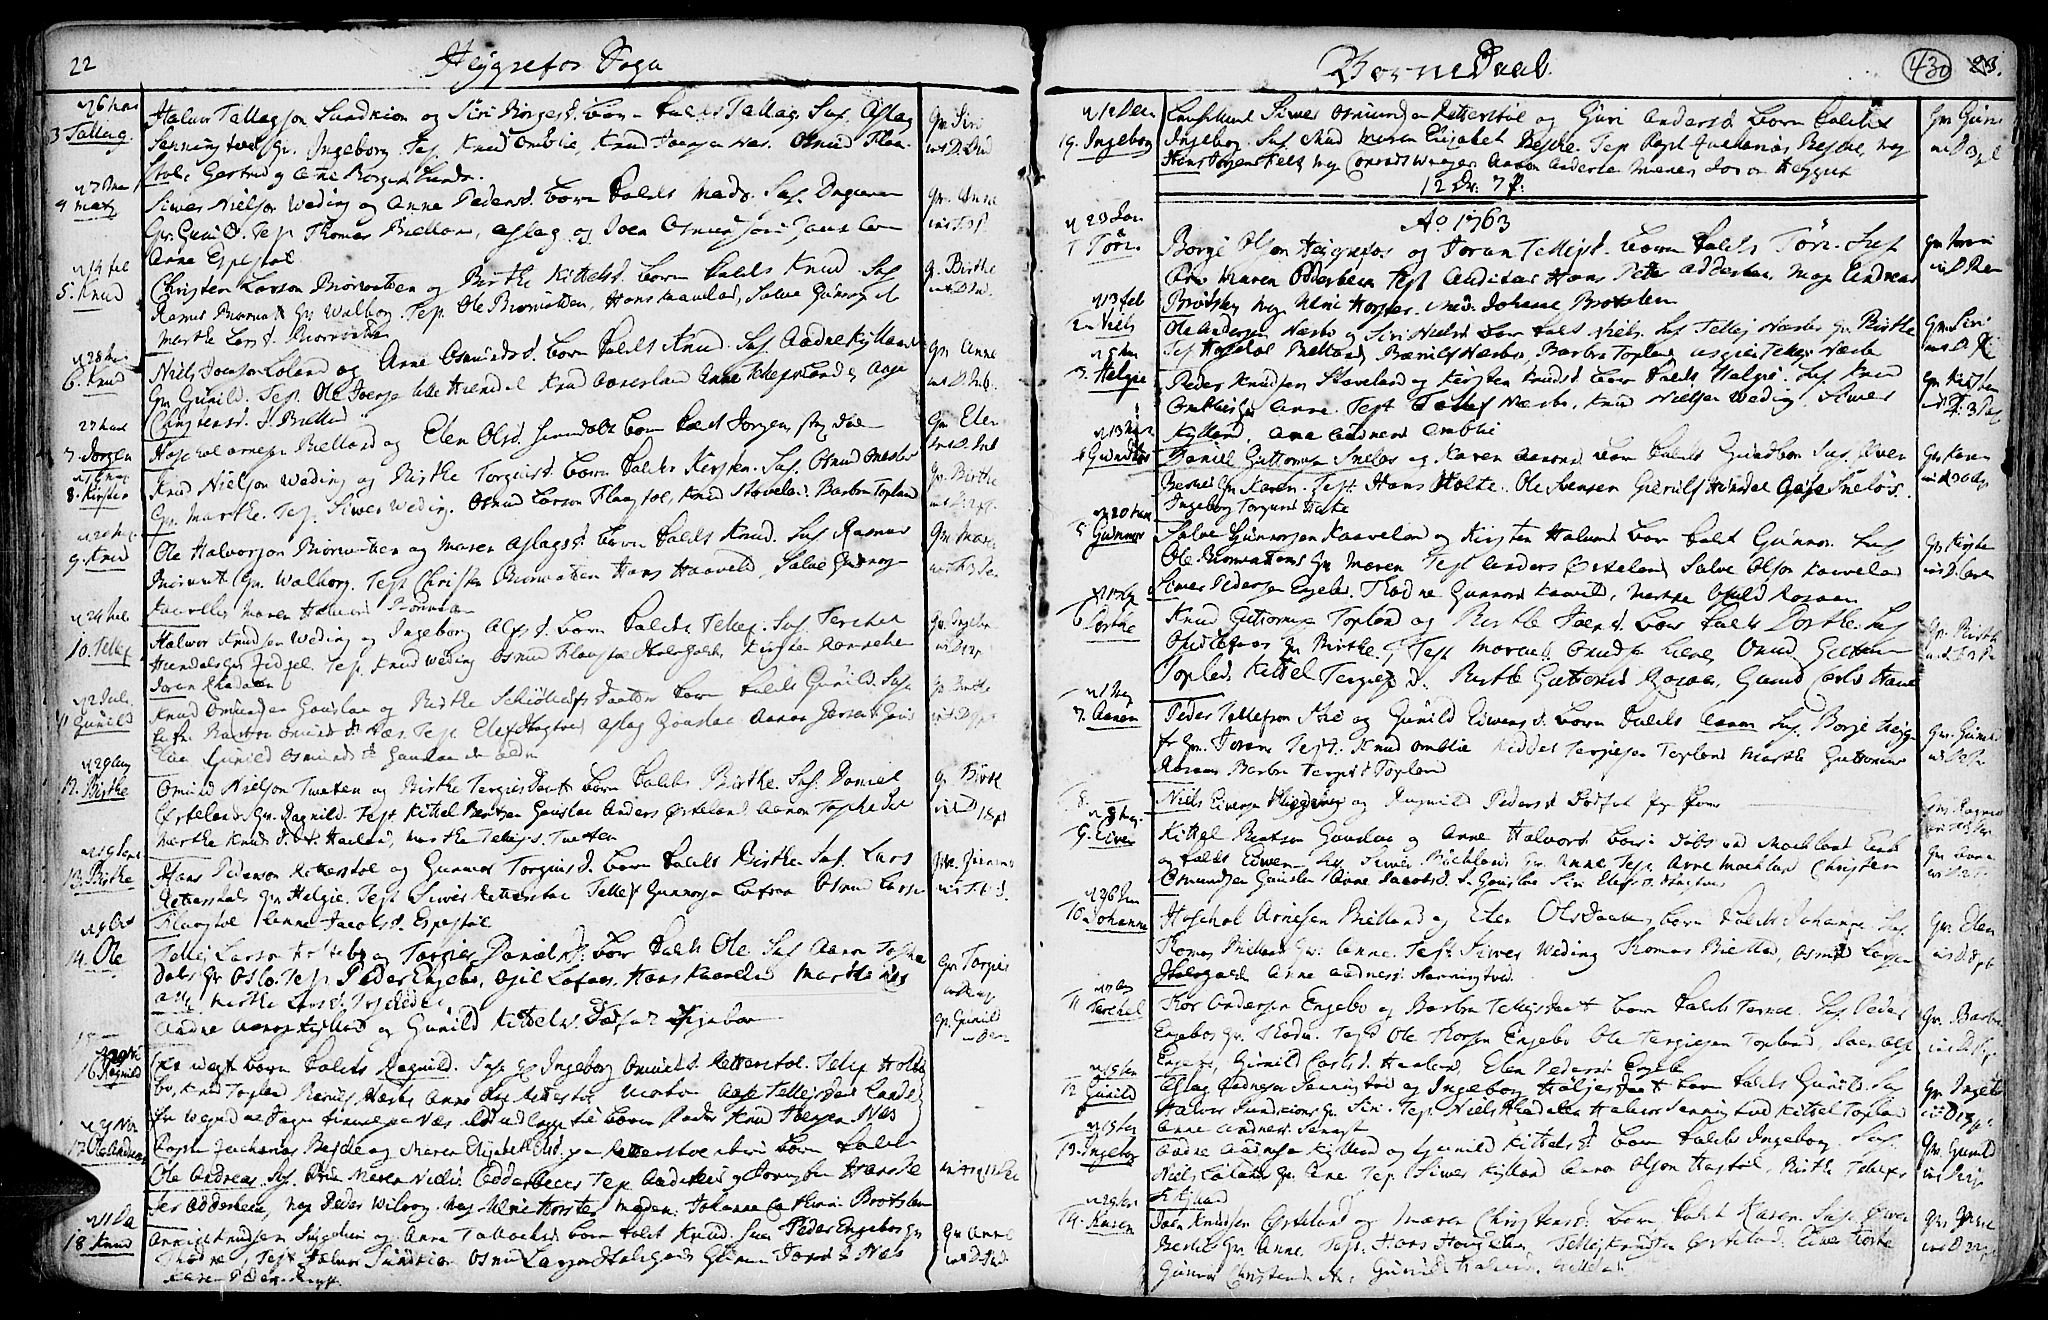 SAK, Hommedal sokneprestkontor, F/Fa/Fab/L0002: Ministerialbok nr. A 2 /3, 1740-1821, s. 430